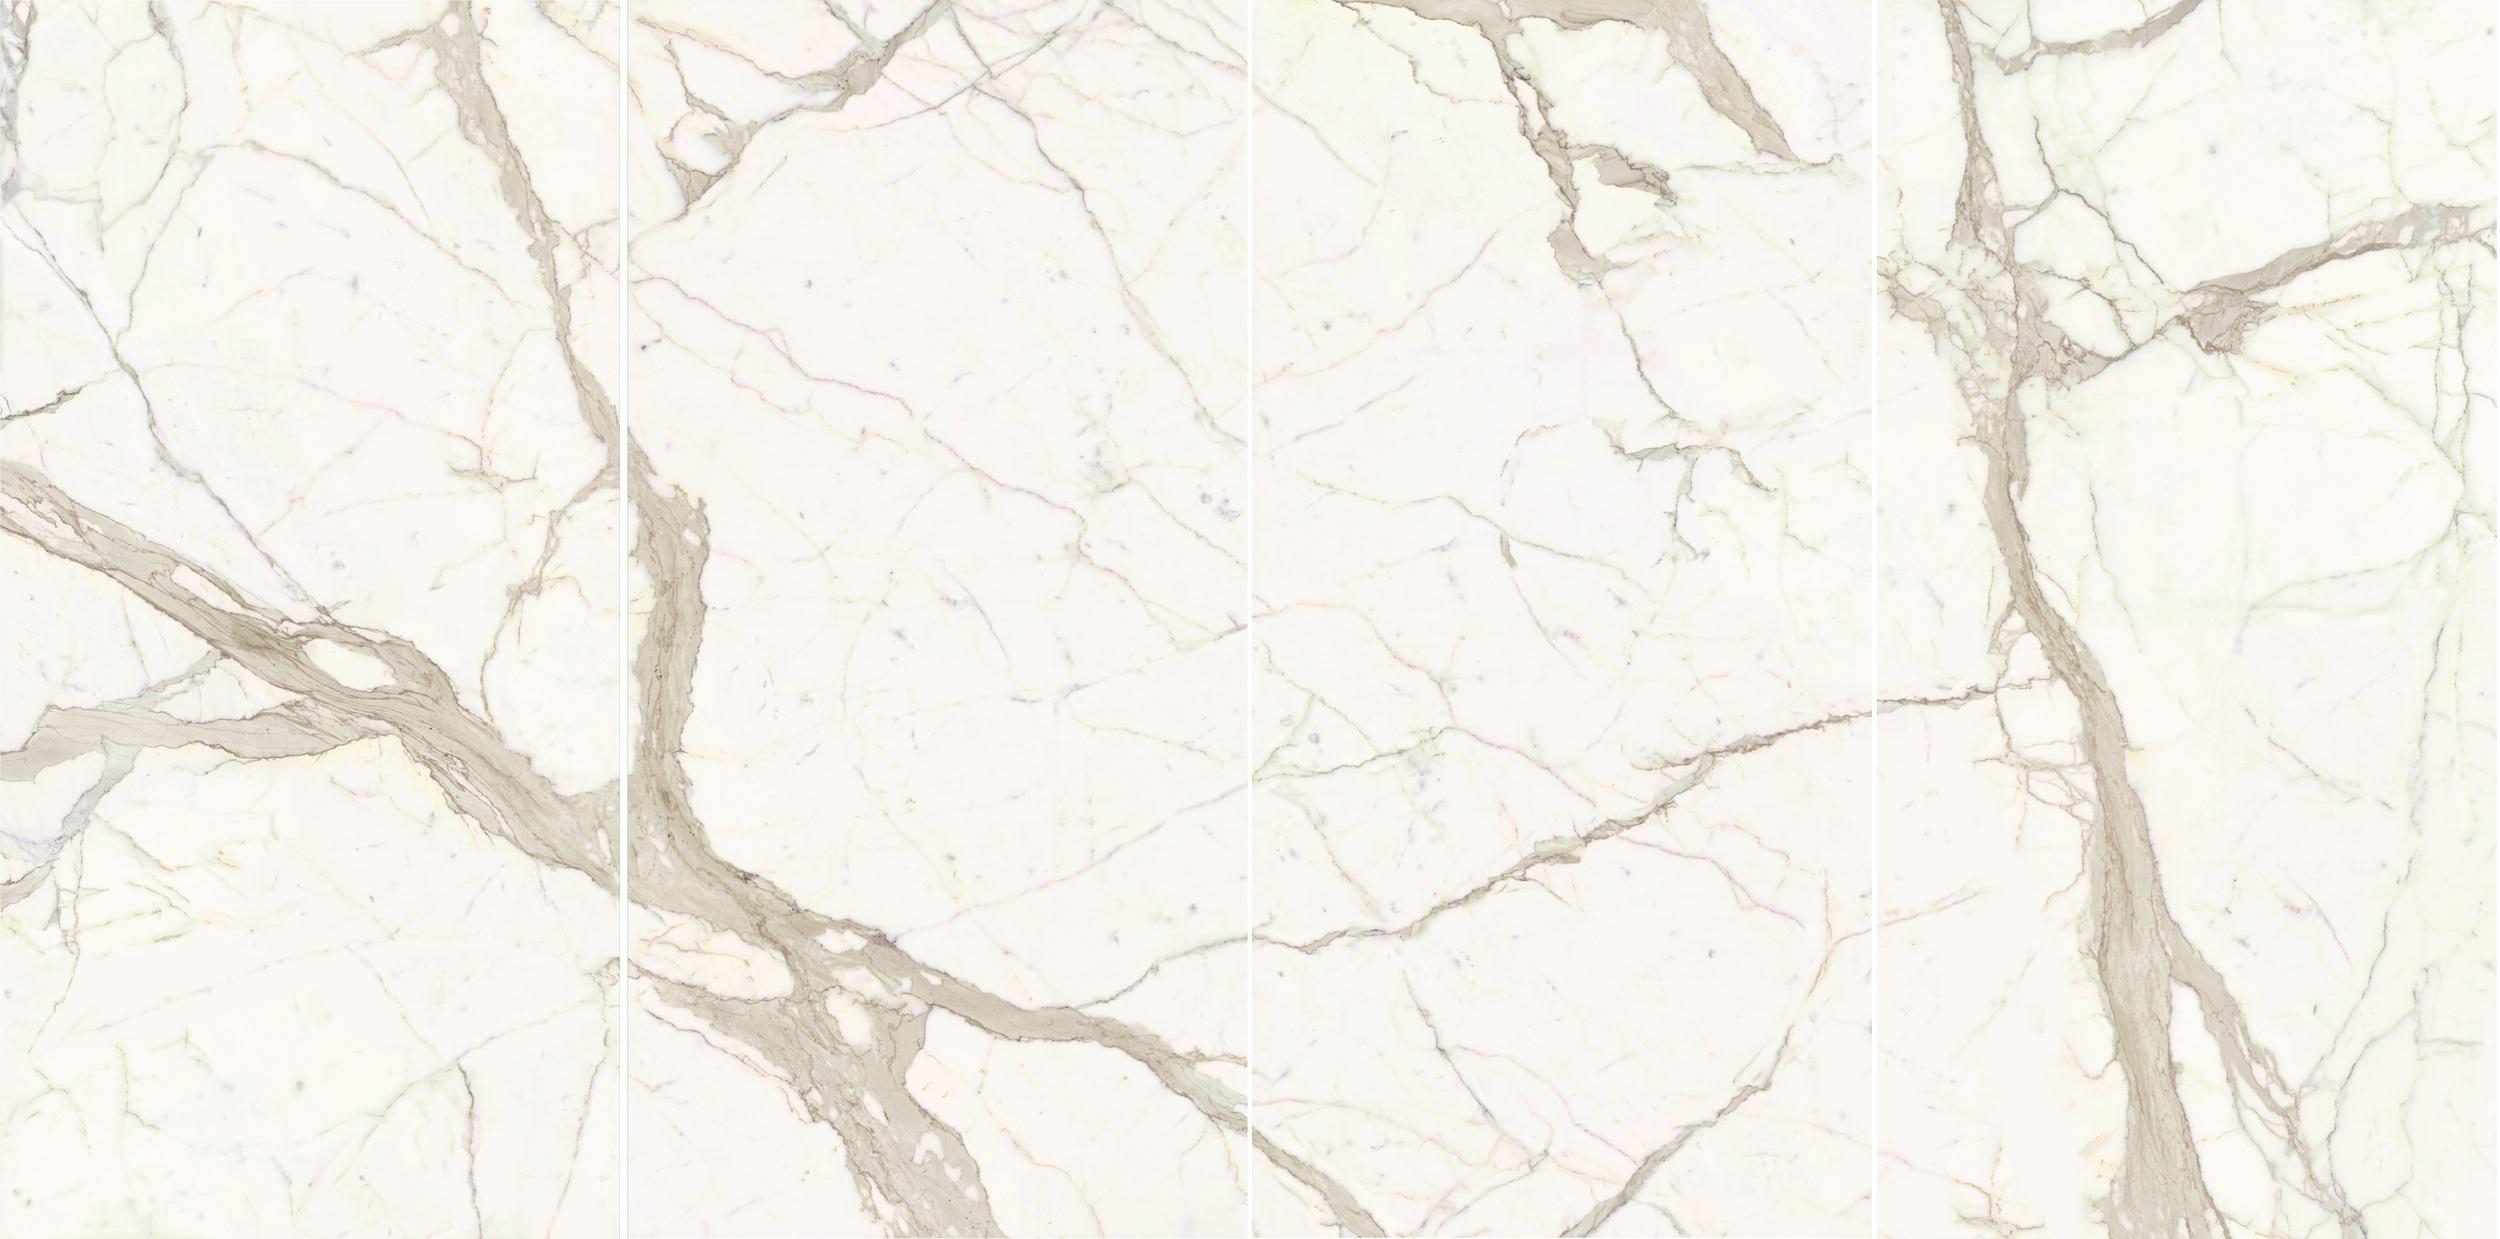 Calacatta 1234 Aeon Stone Tile Granite Marble